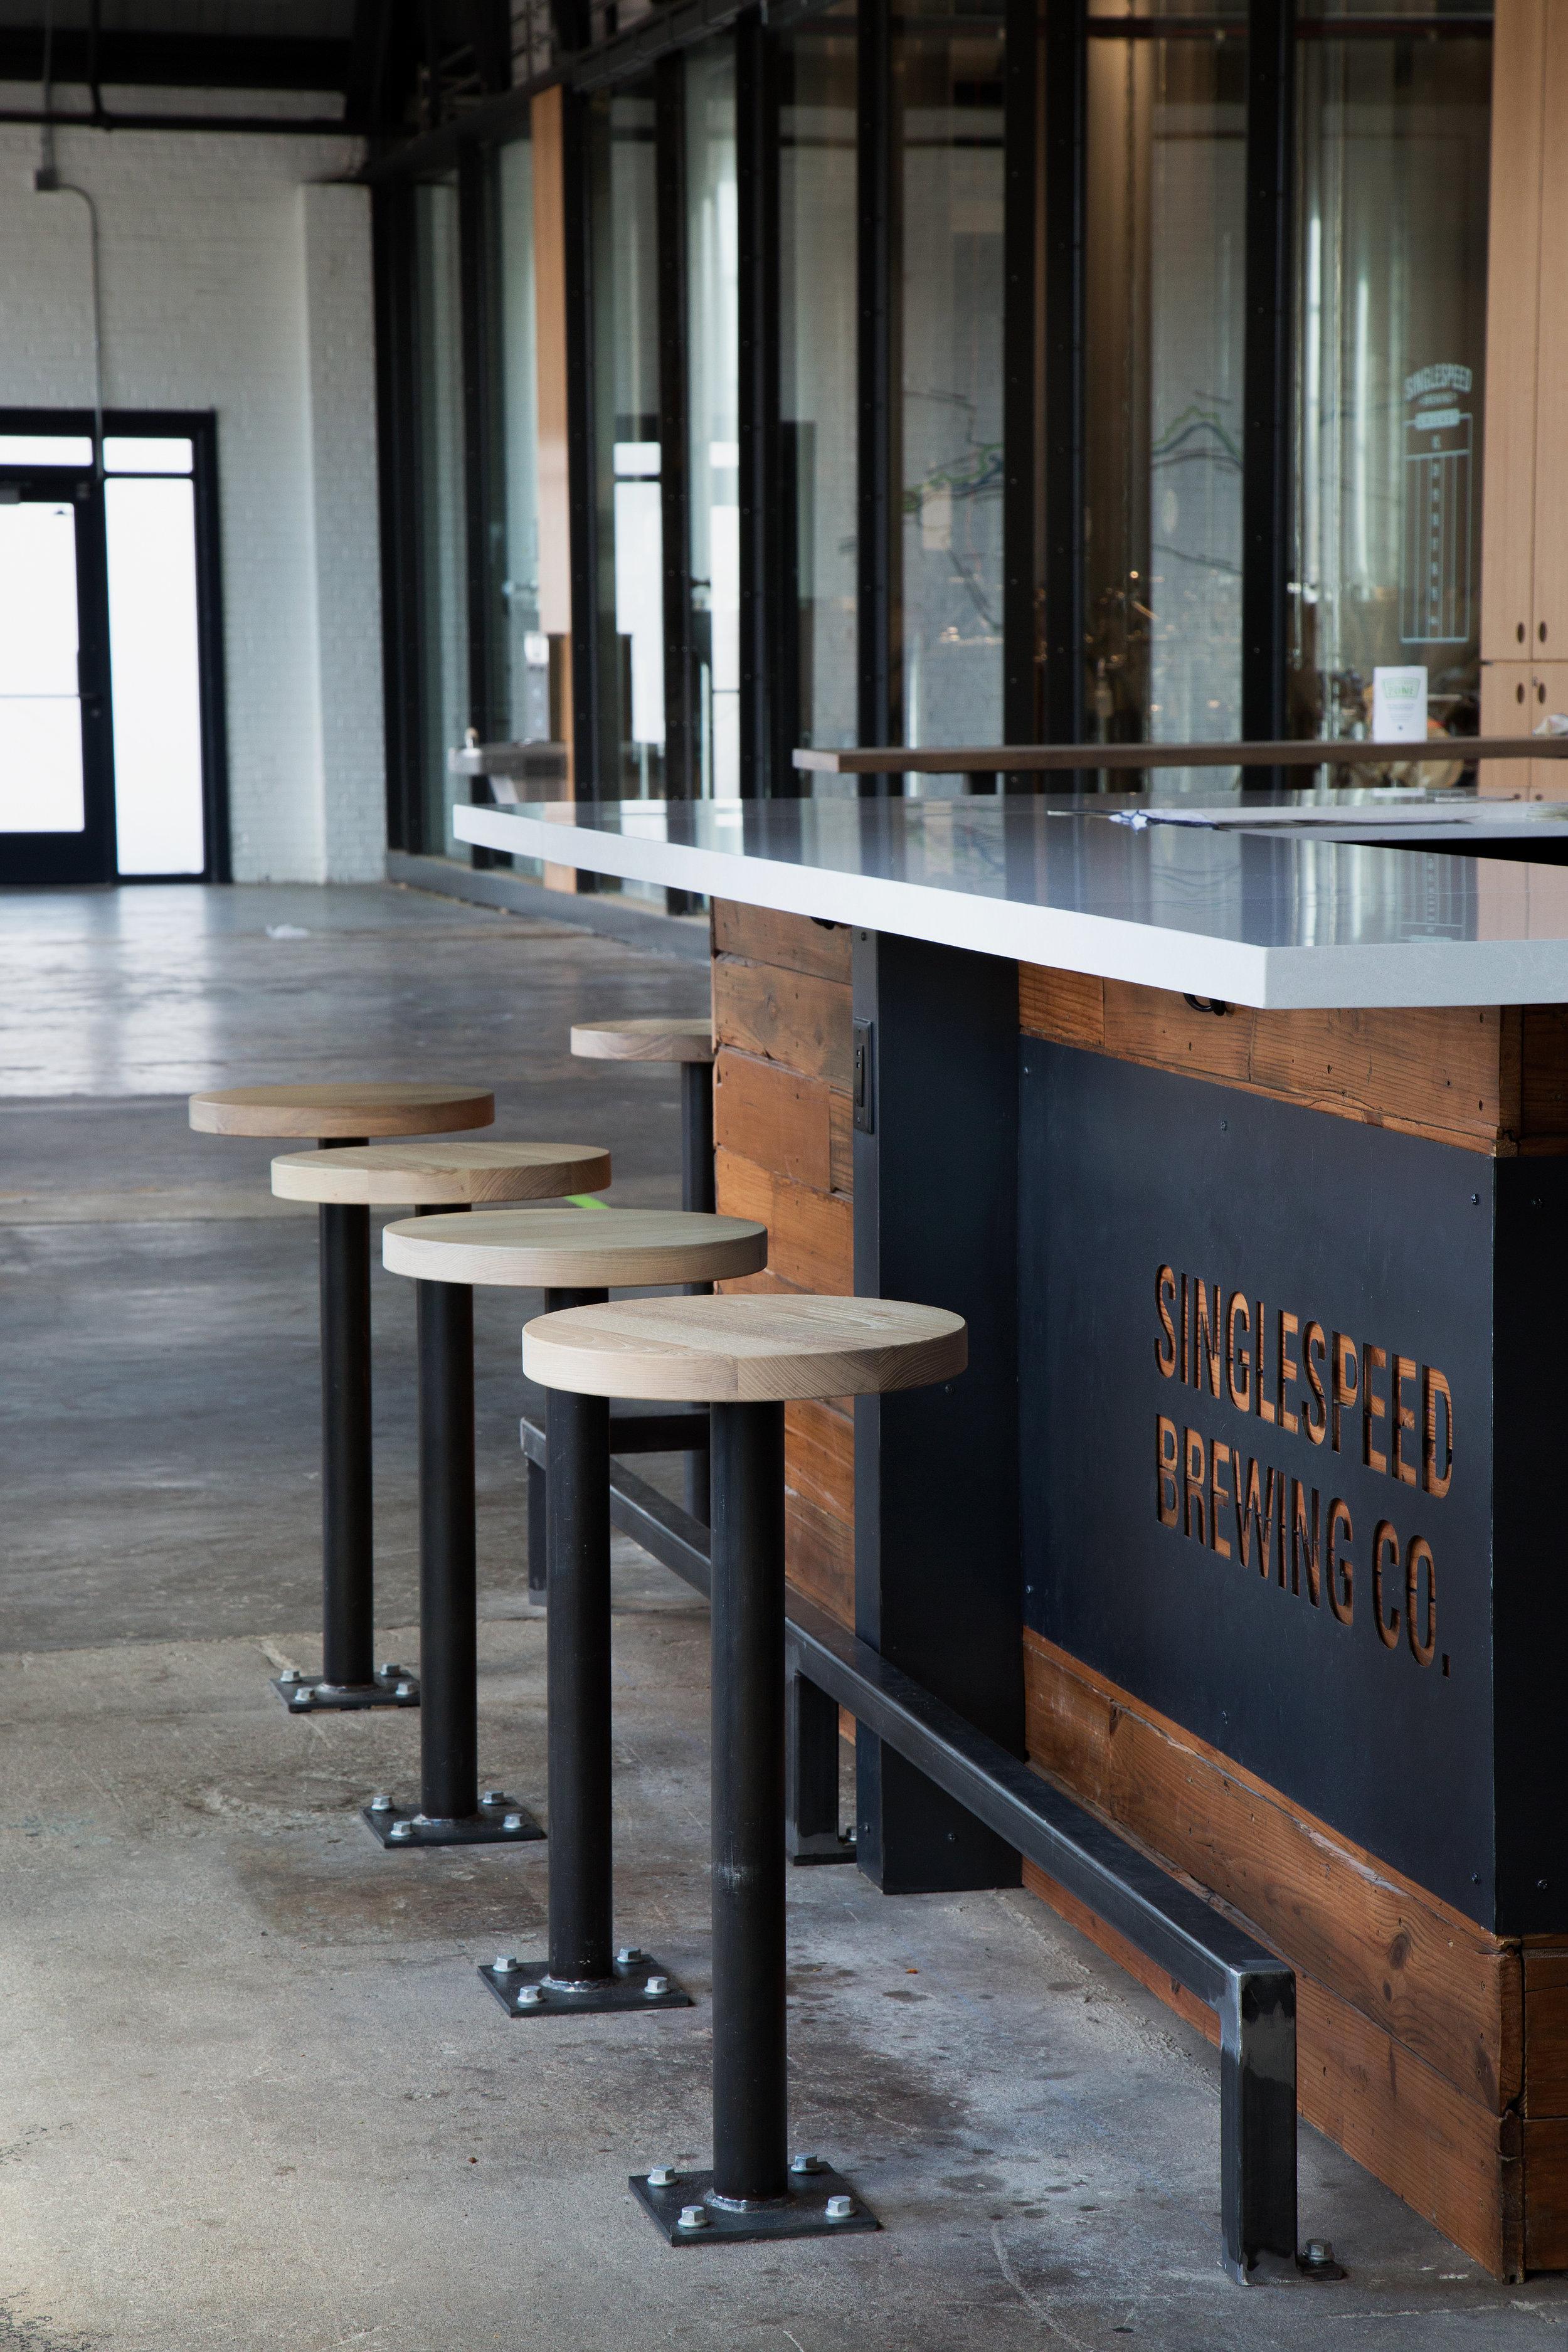 Solid ash wood bar stool seats